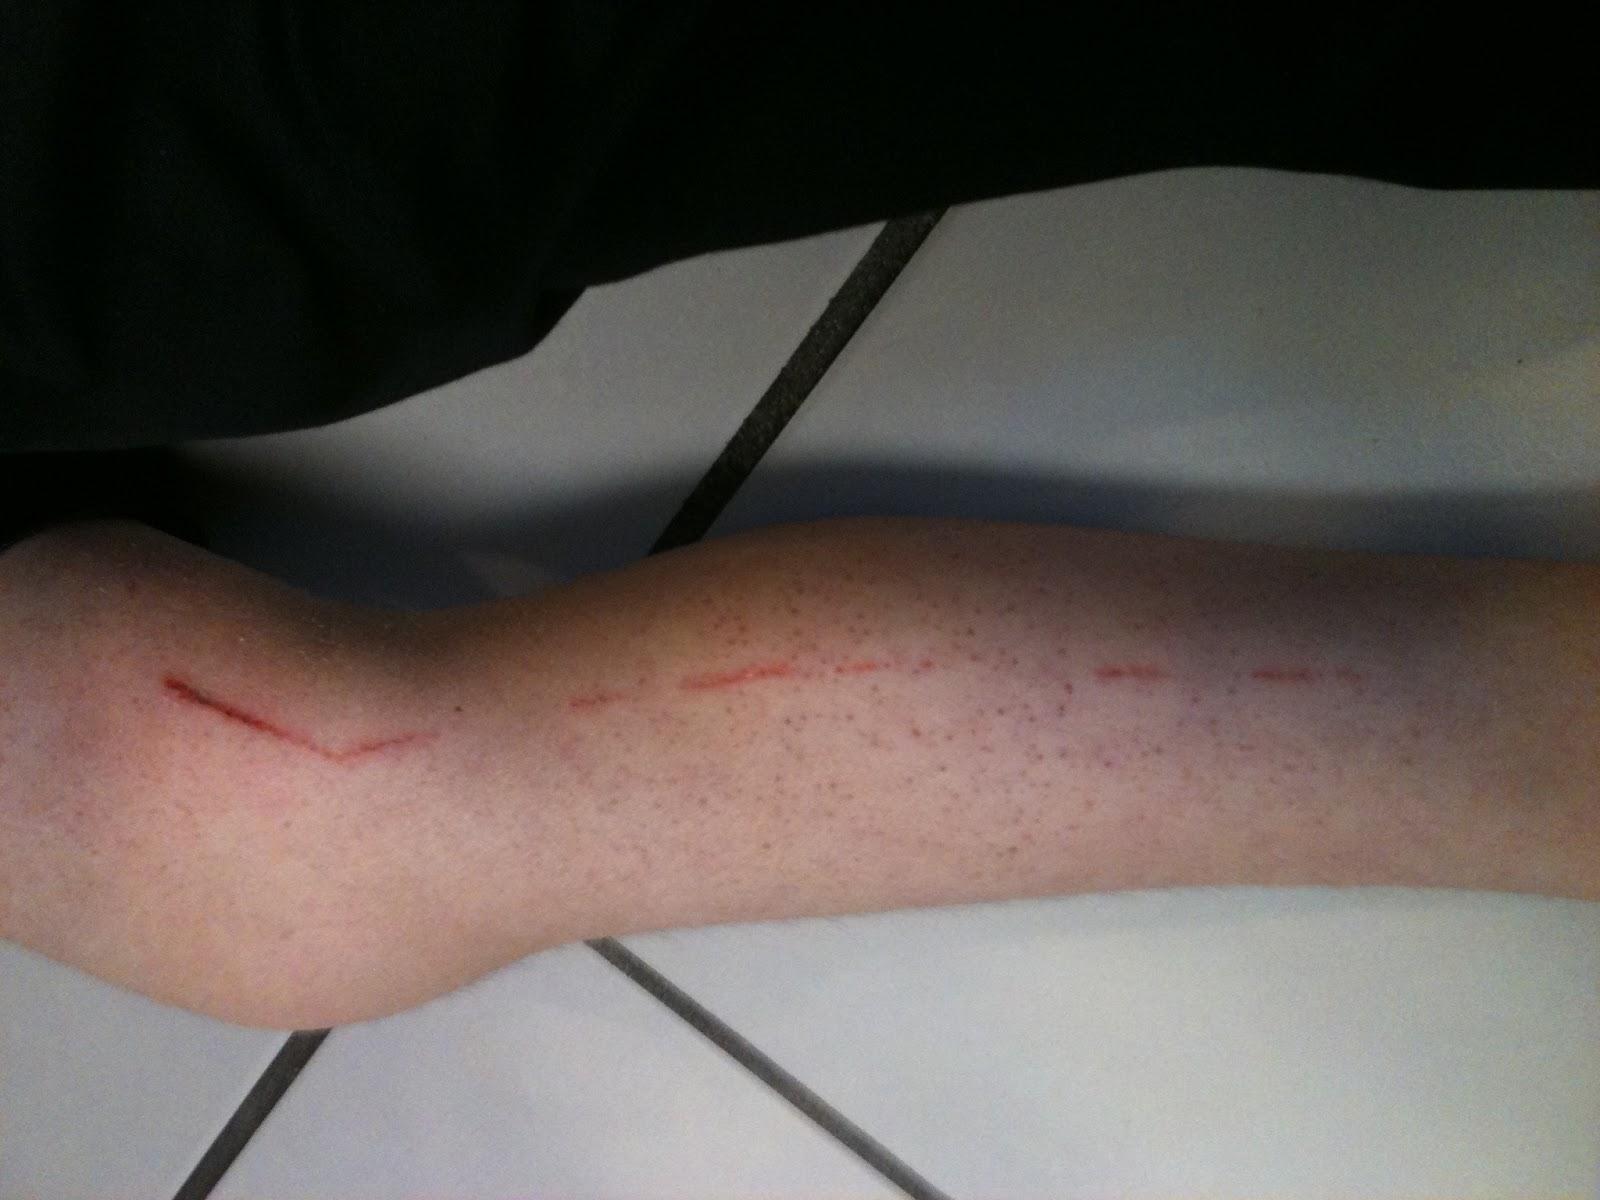 Cast saws CAN cut skin | Amber Argyle